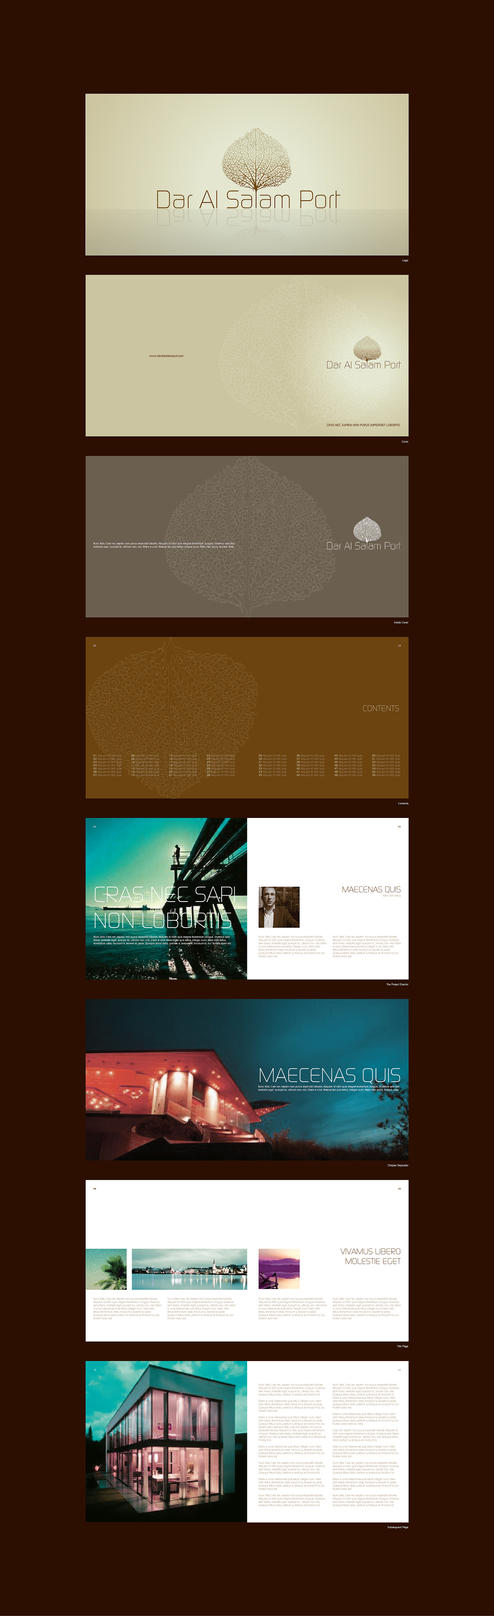 Dar Al Salam Port - Brochure by yienkeat